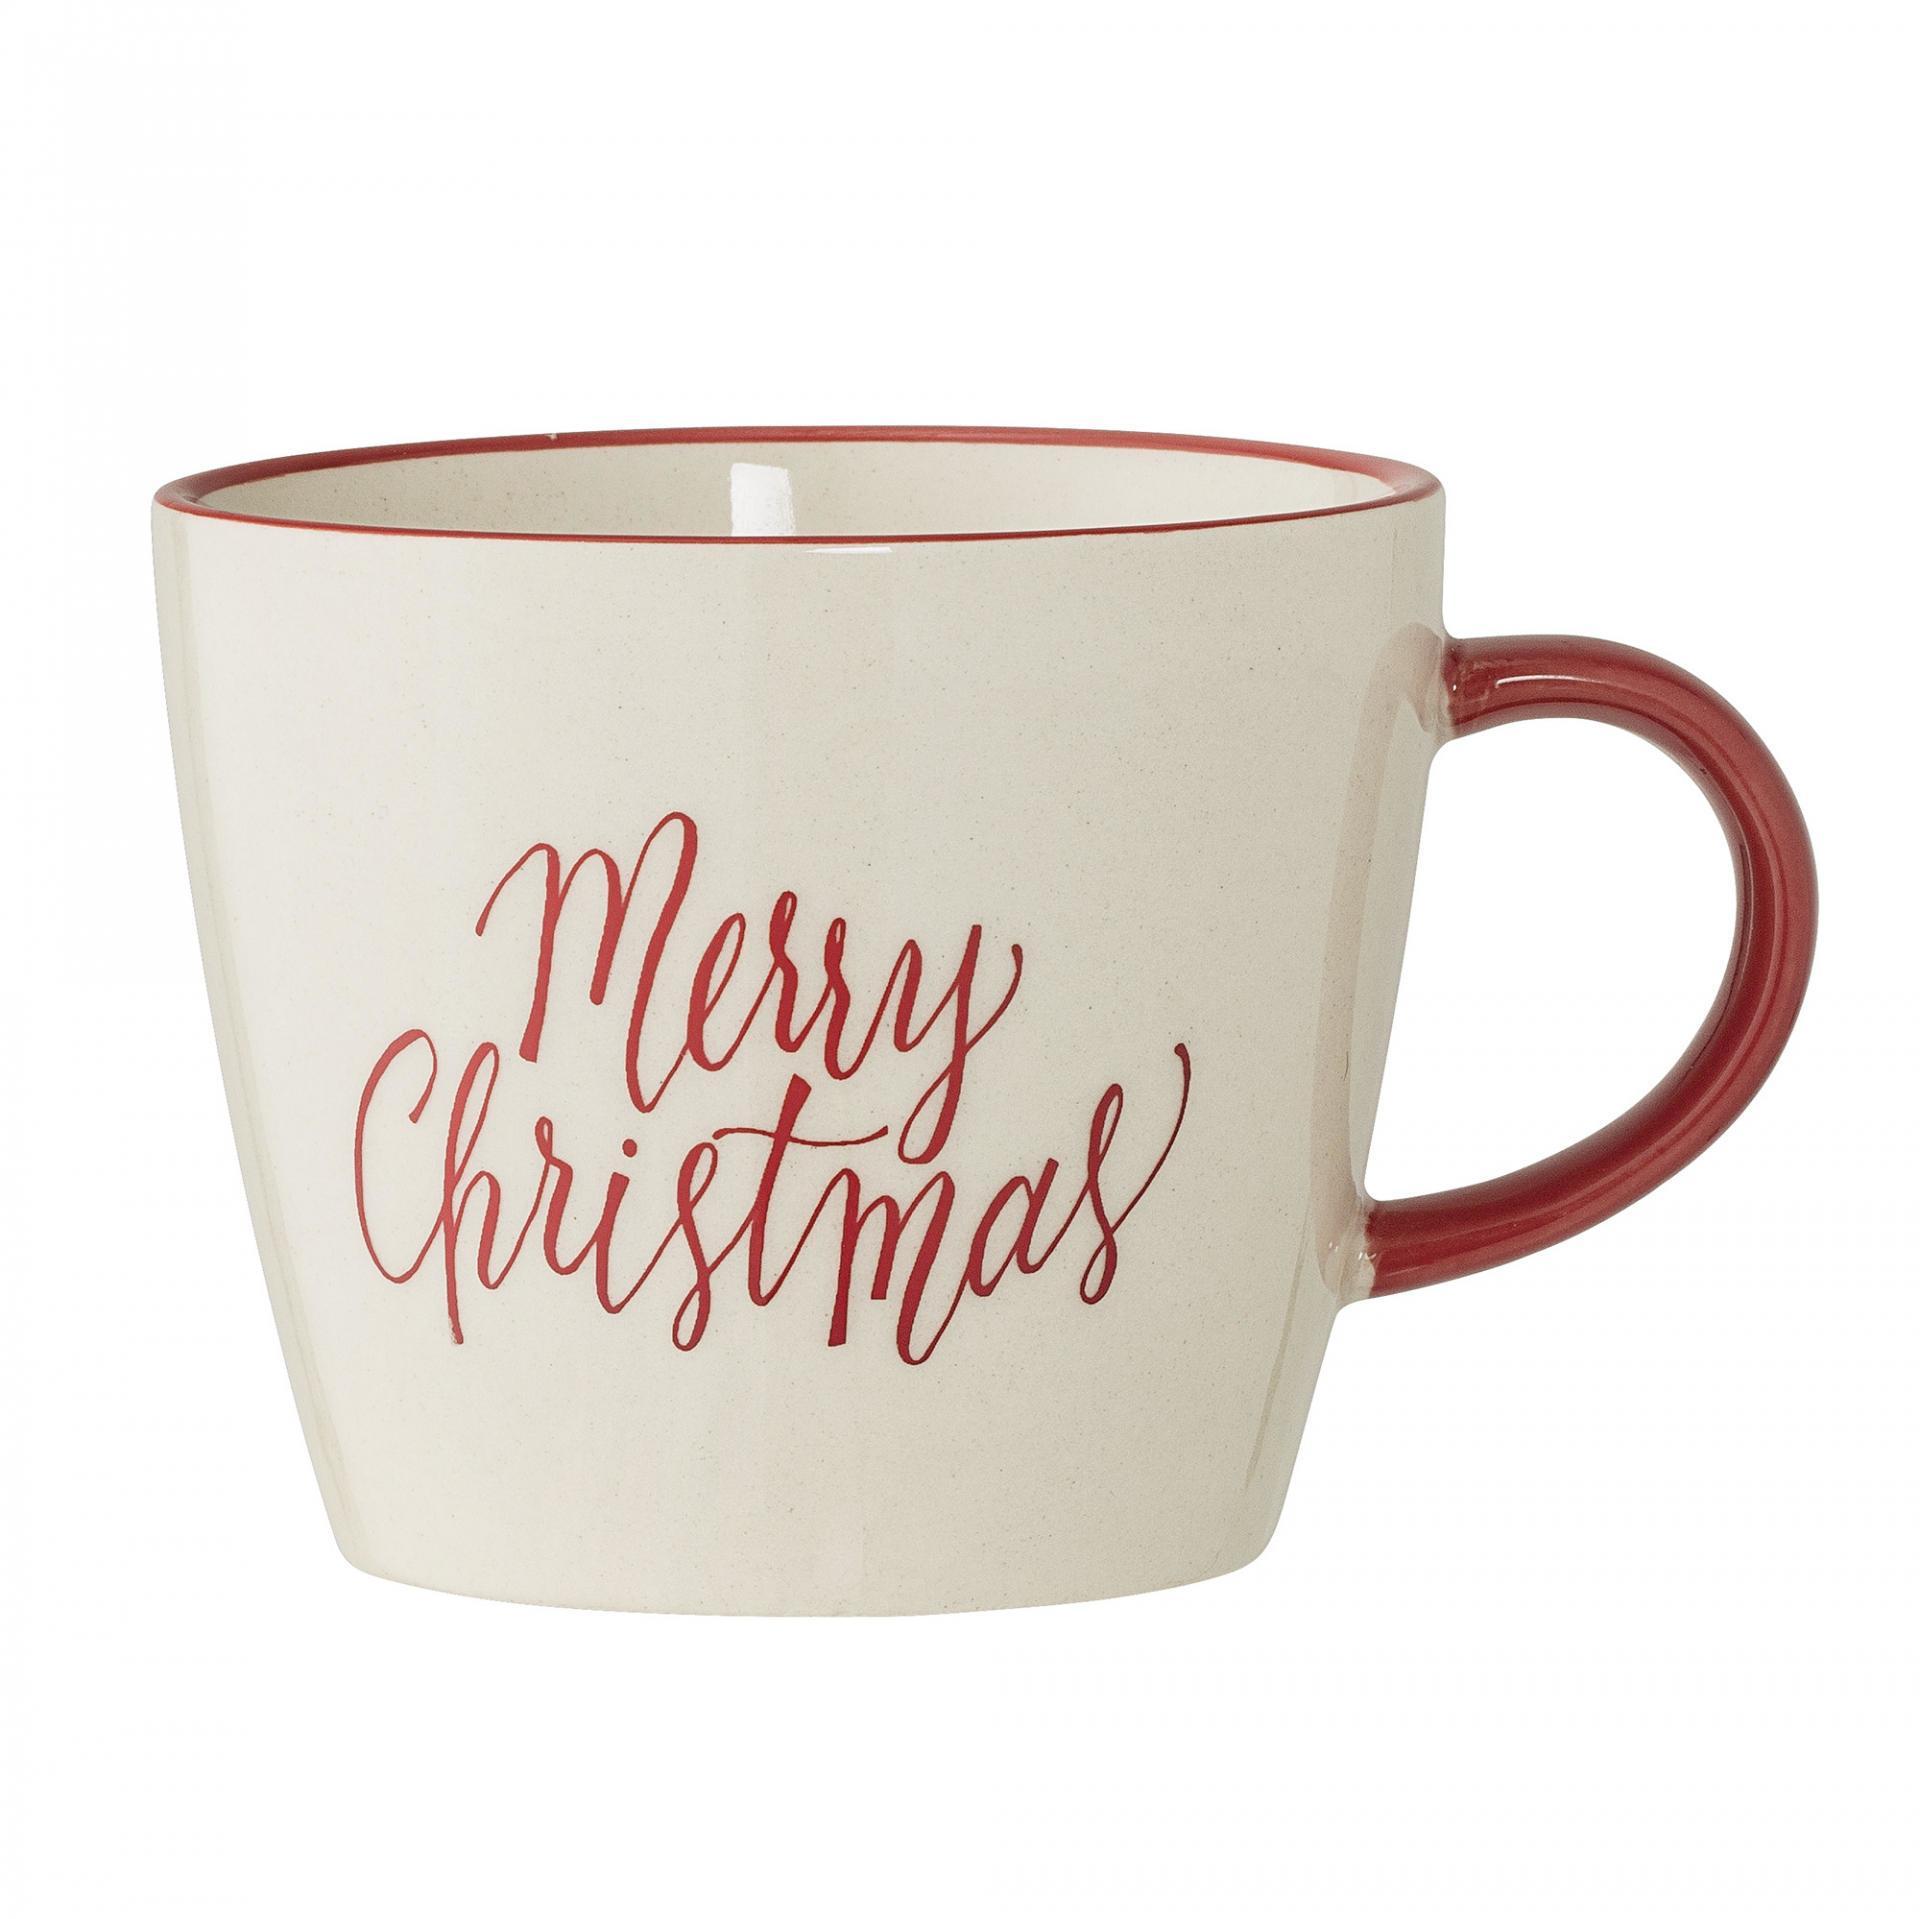 Bloomingville Keramický hrnek Merry Christmas red, červená barva, krémová barva, keramika